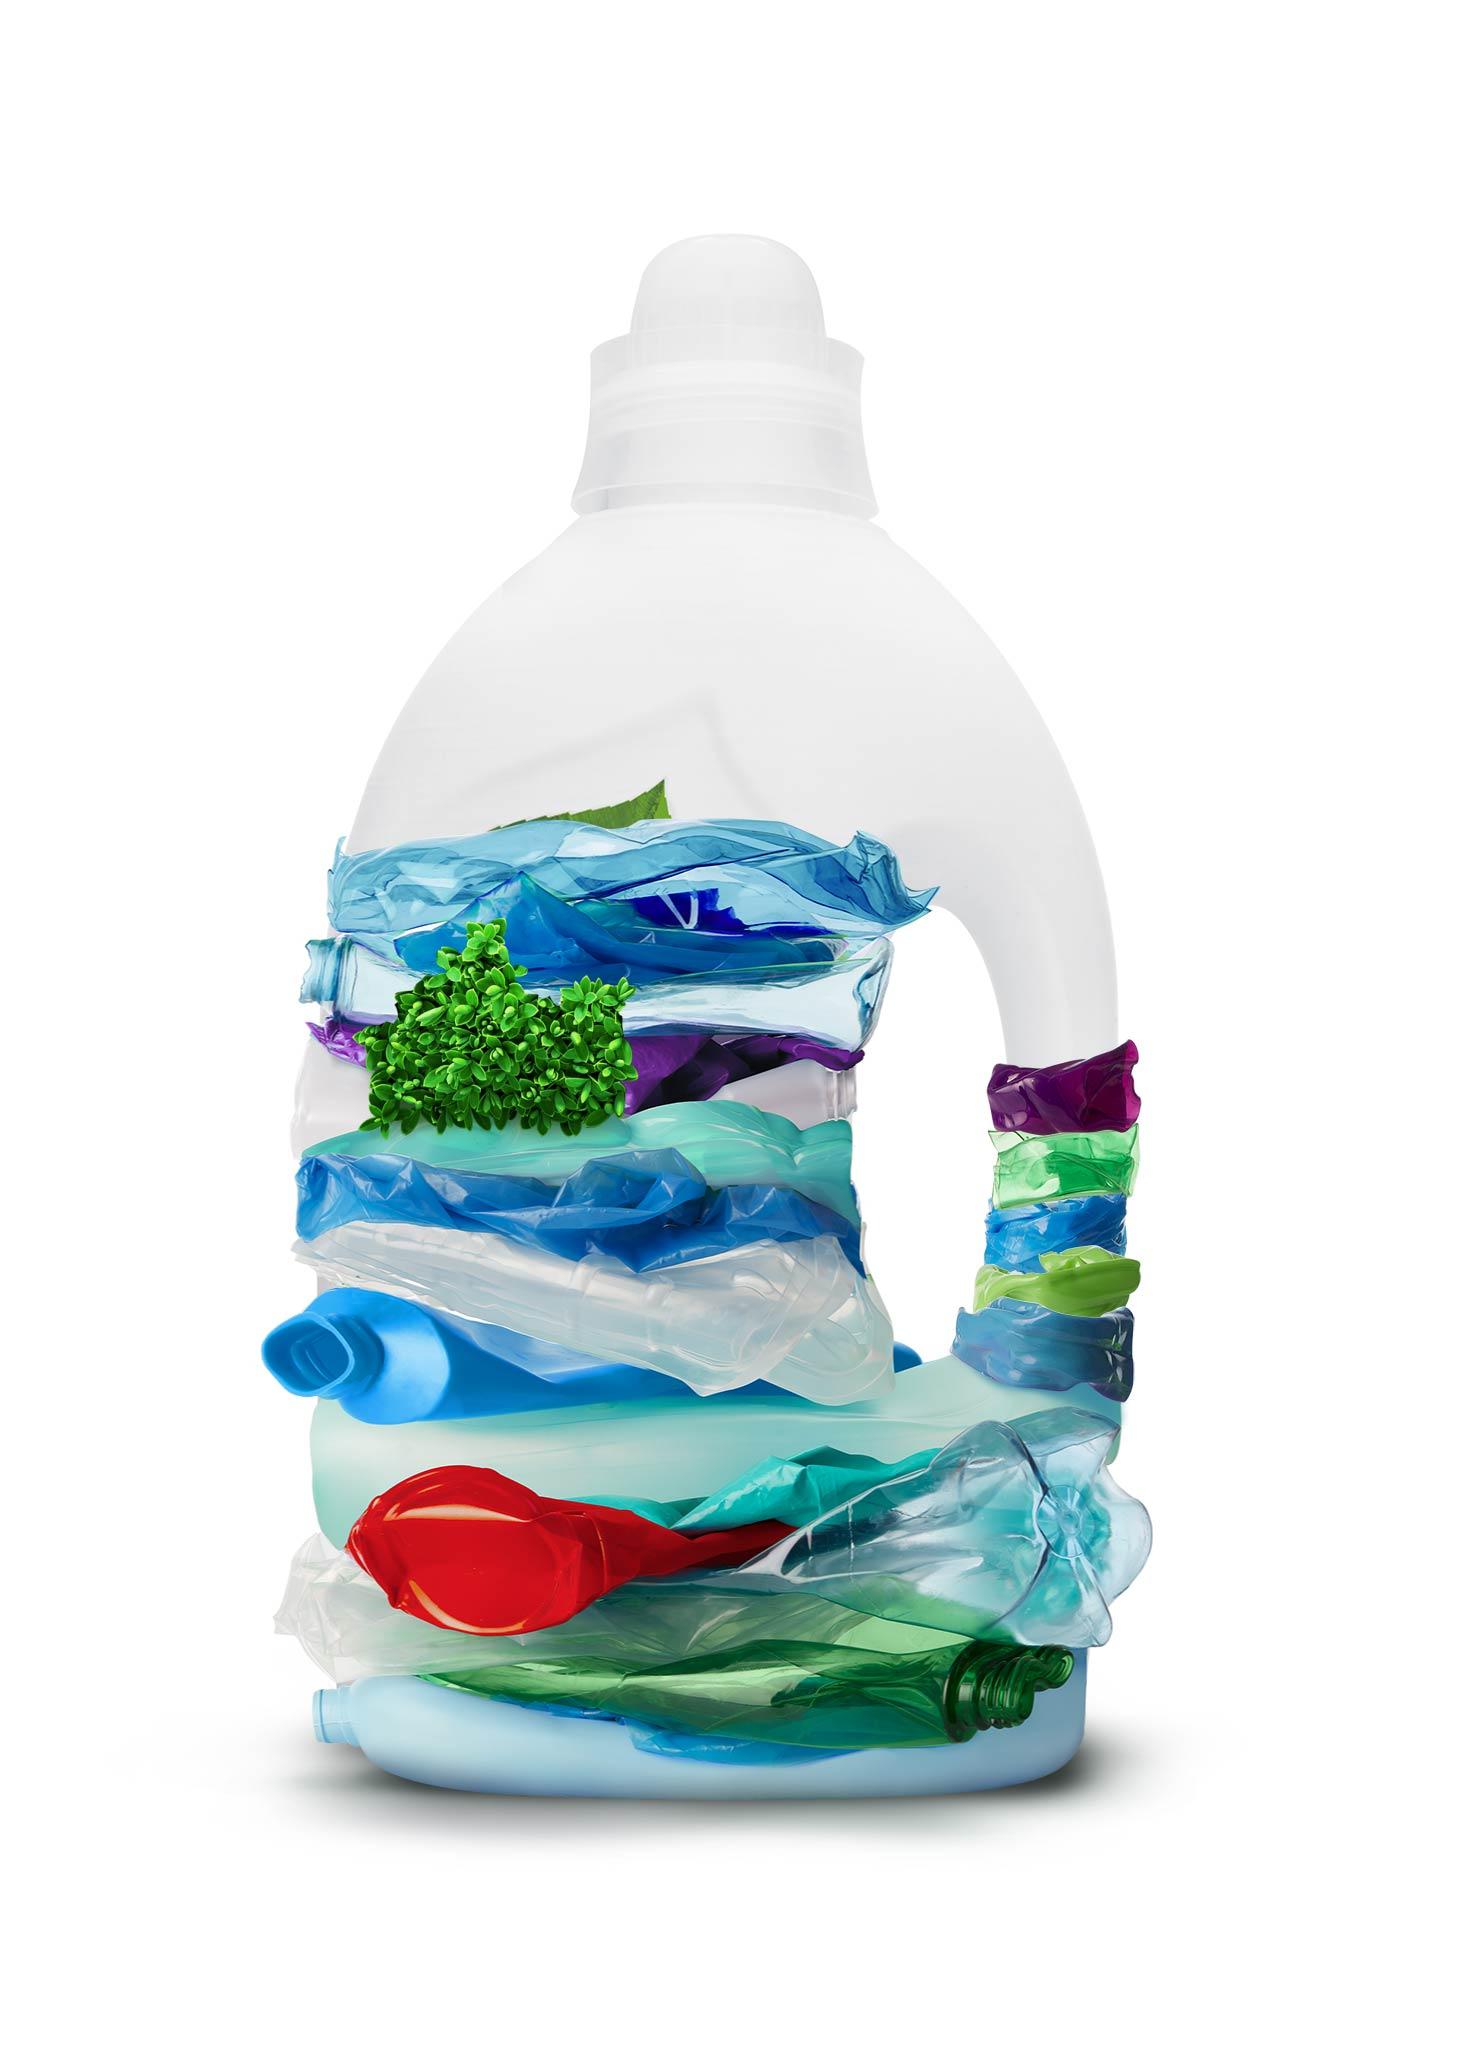 EURO-Laundry_Recycling_06.jpg